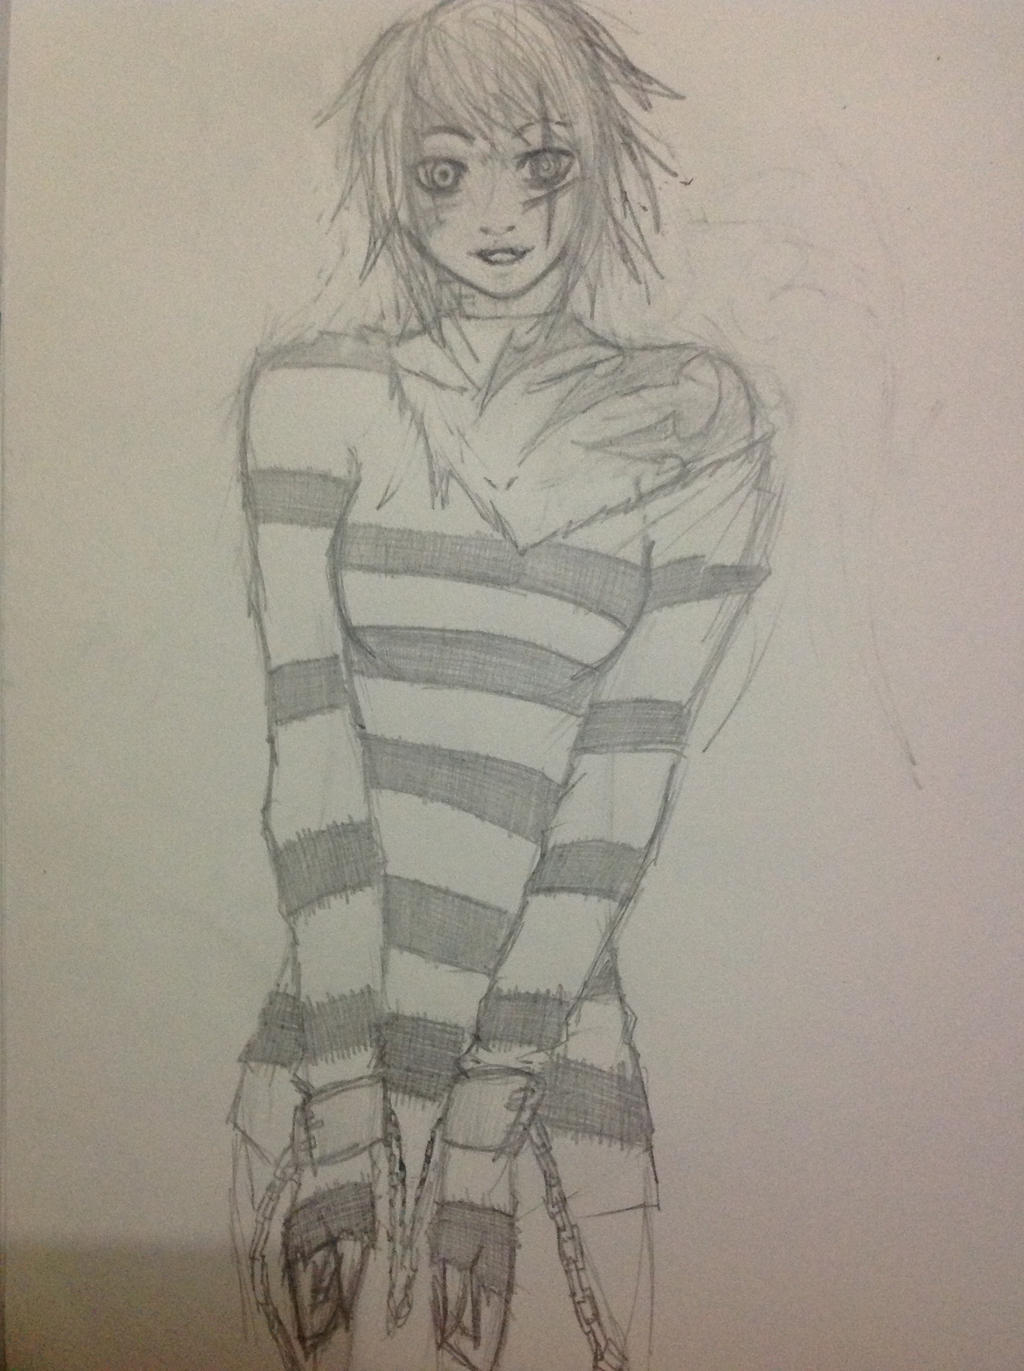 Prisoner by Demon-Shinob1